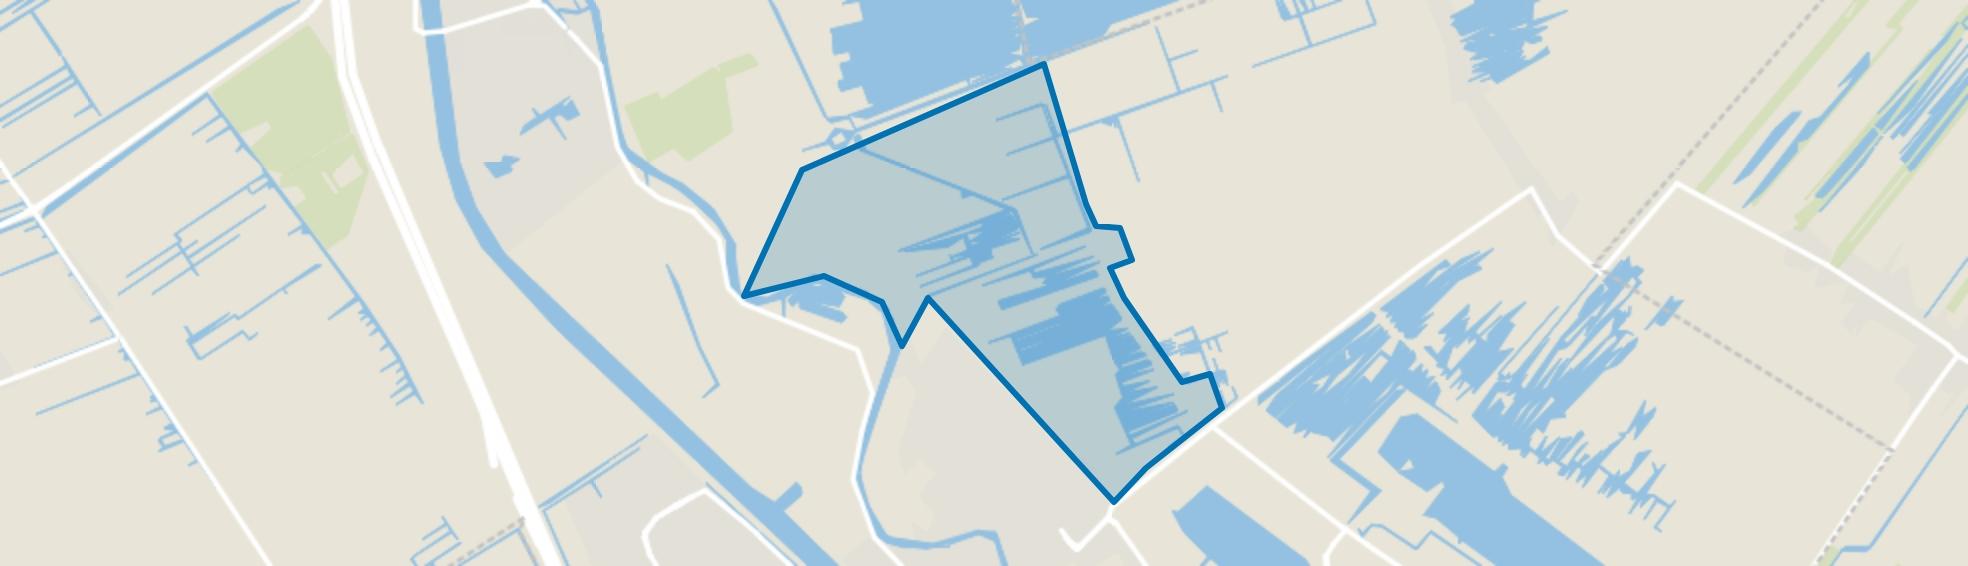 Bethunepolder-zuid, Maarssen map